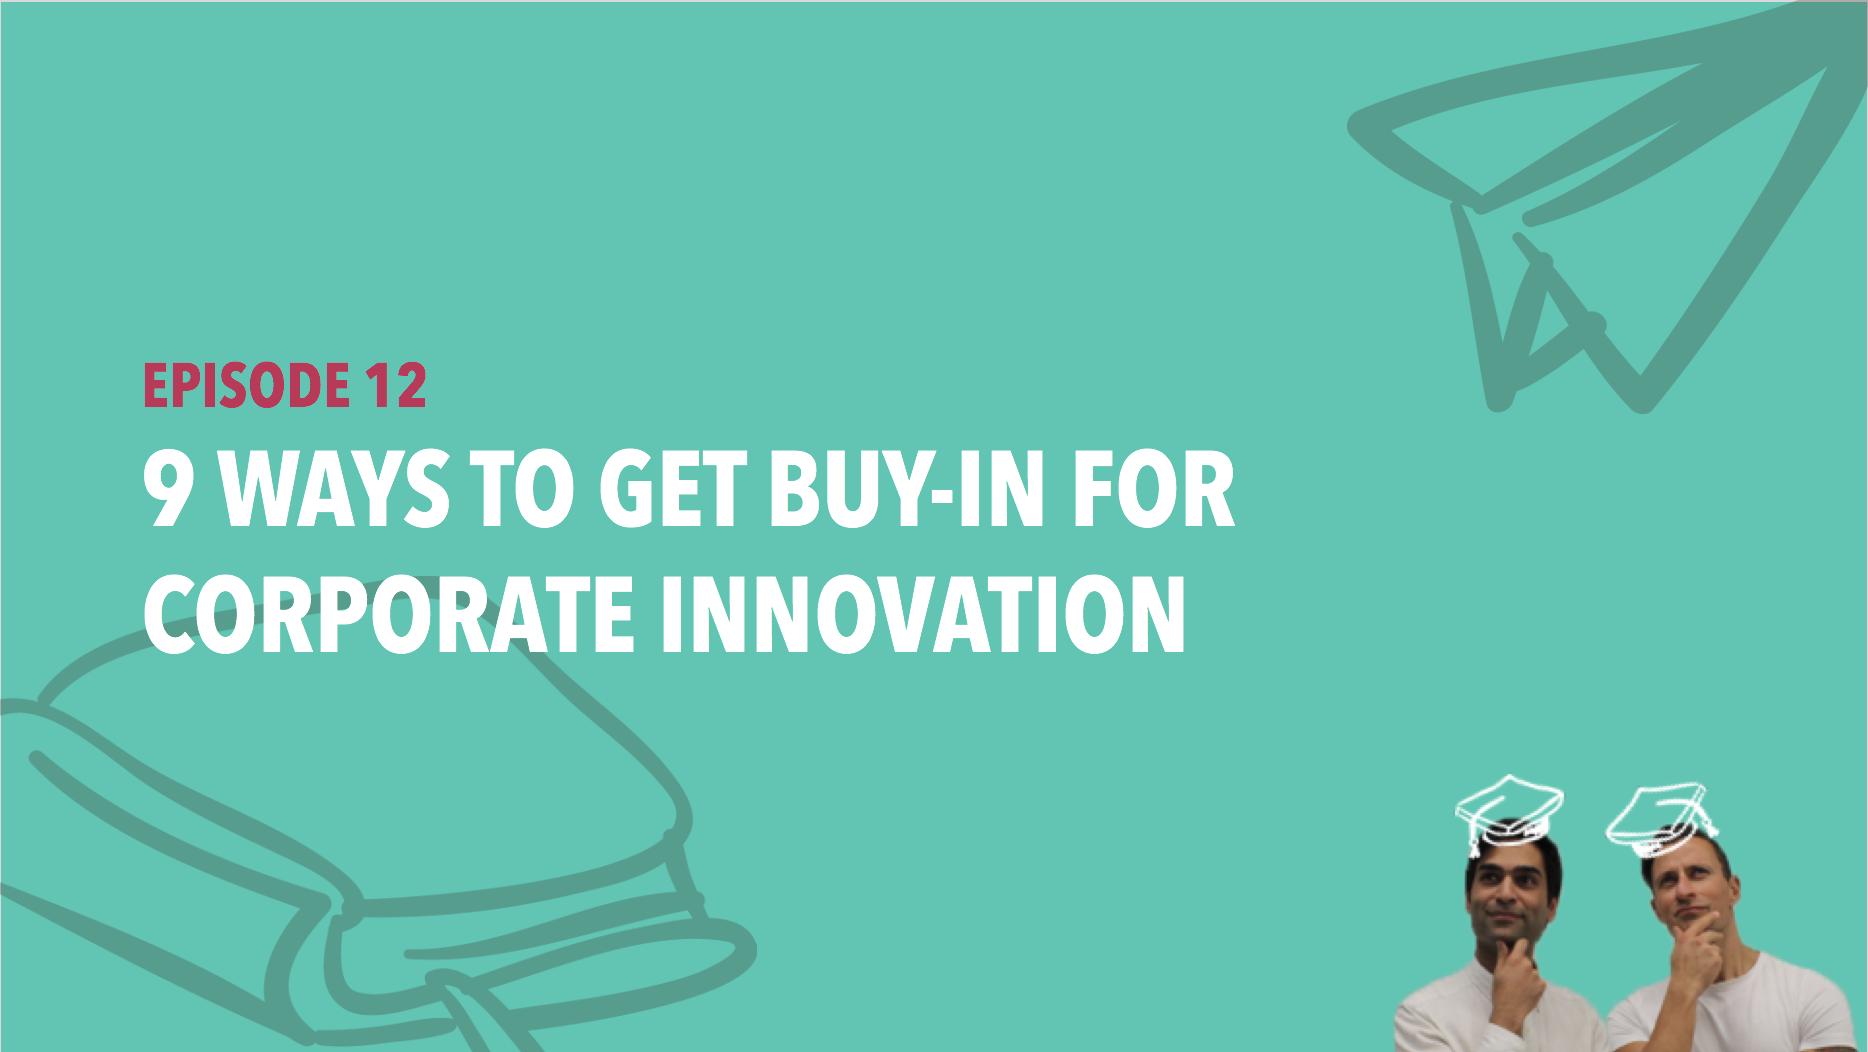 CiSchool Episode #012: 9 Ways to get buy-in for corporate innovation